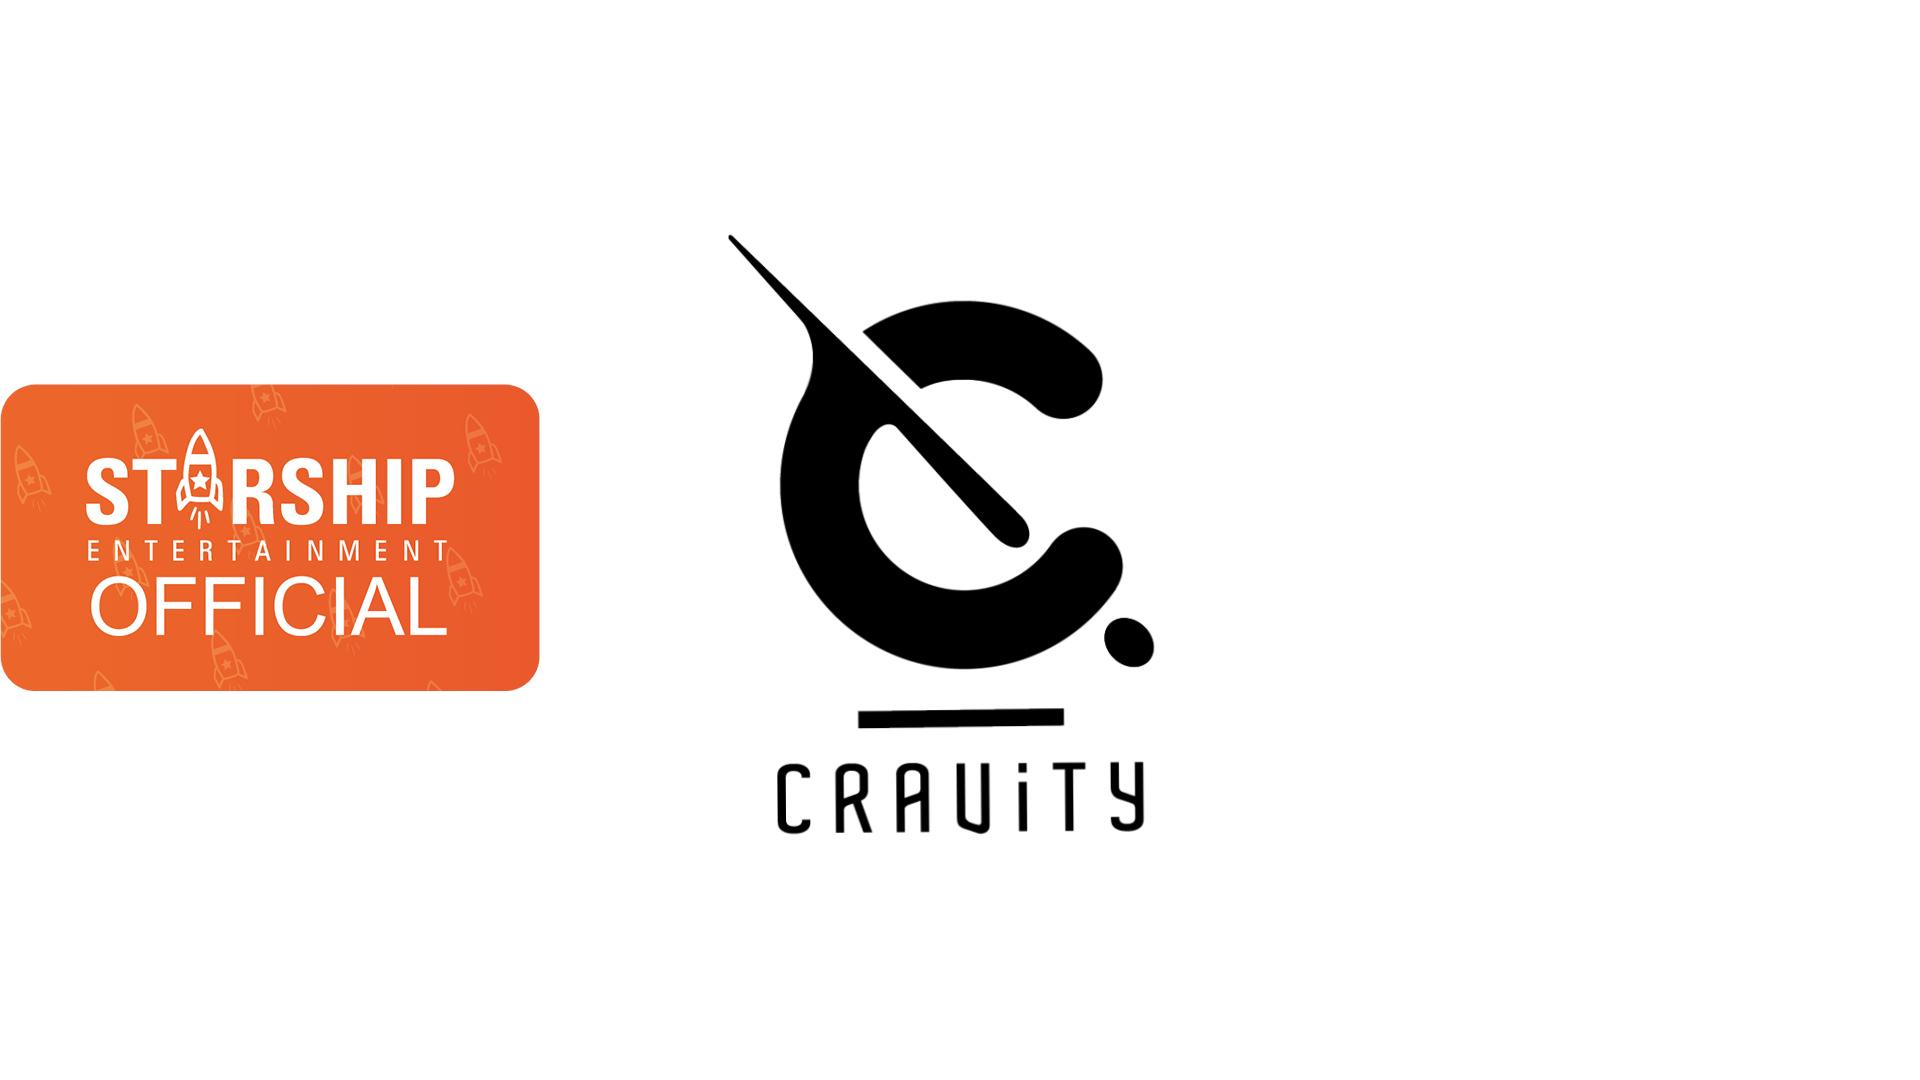 CRAVITY (크래비티) OFFICIAL LOGO MOTION